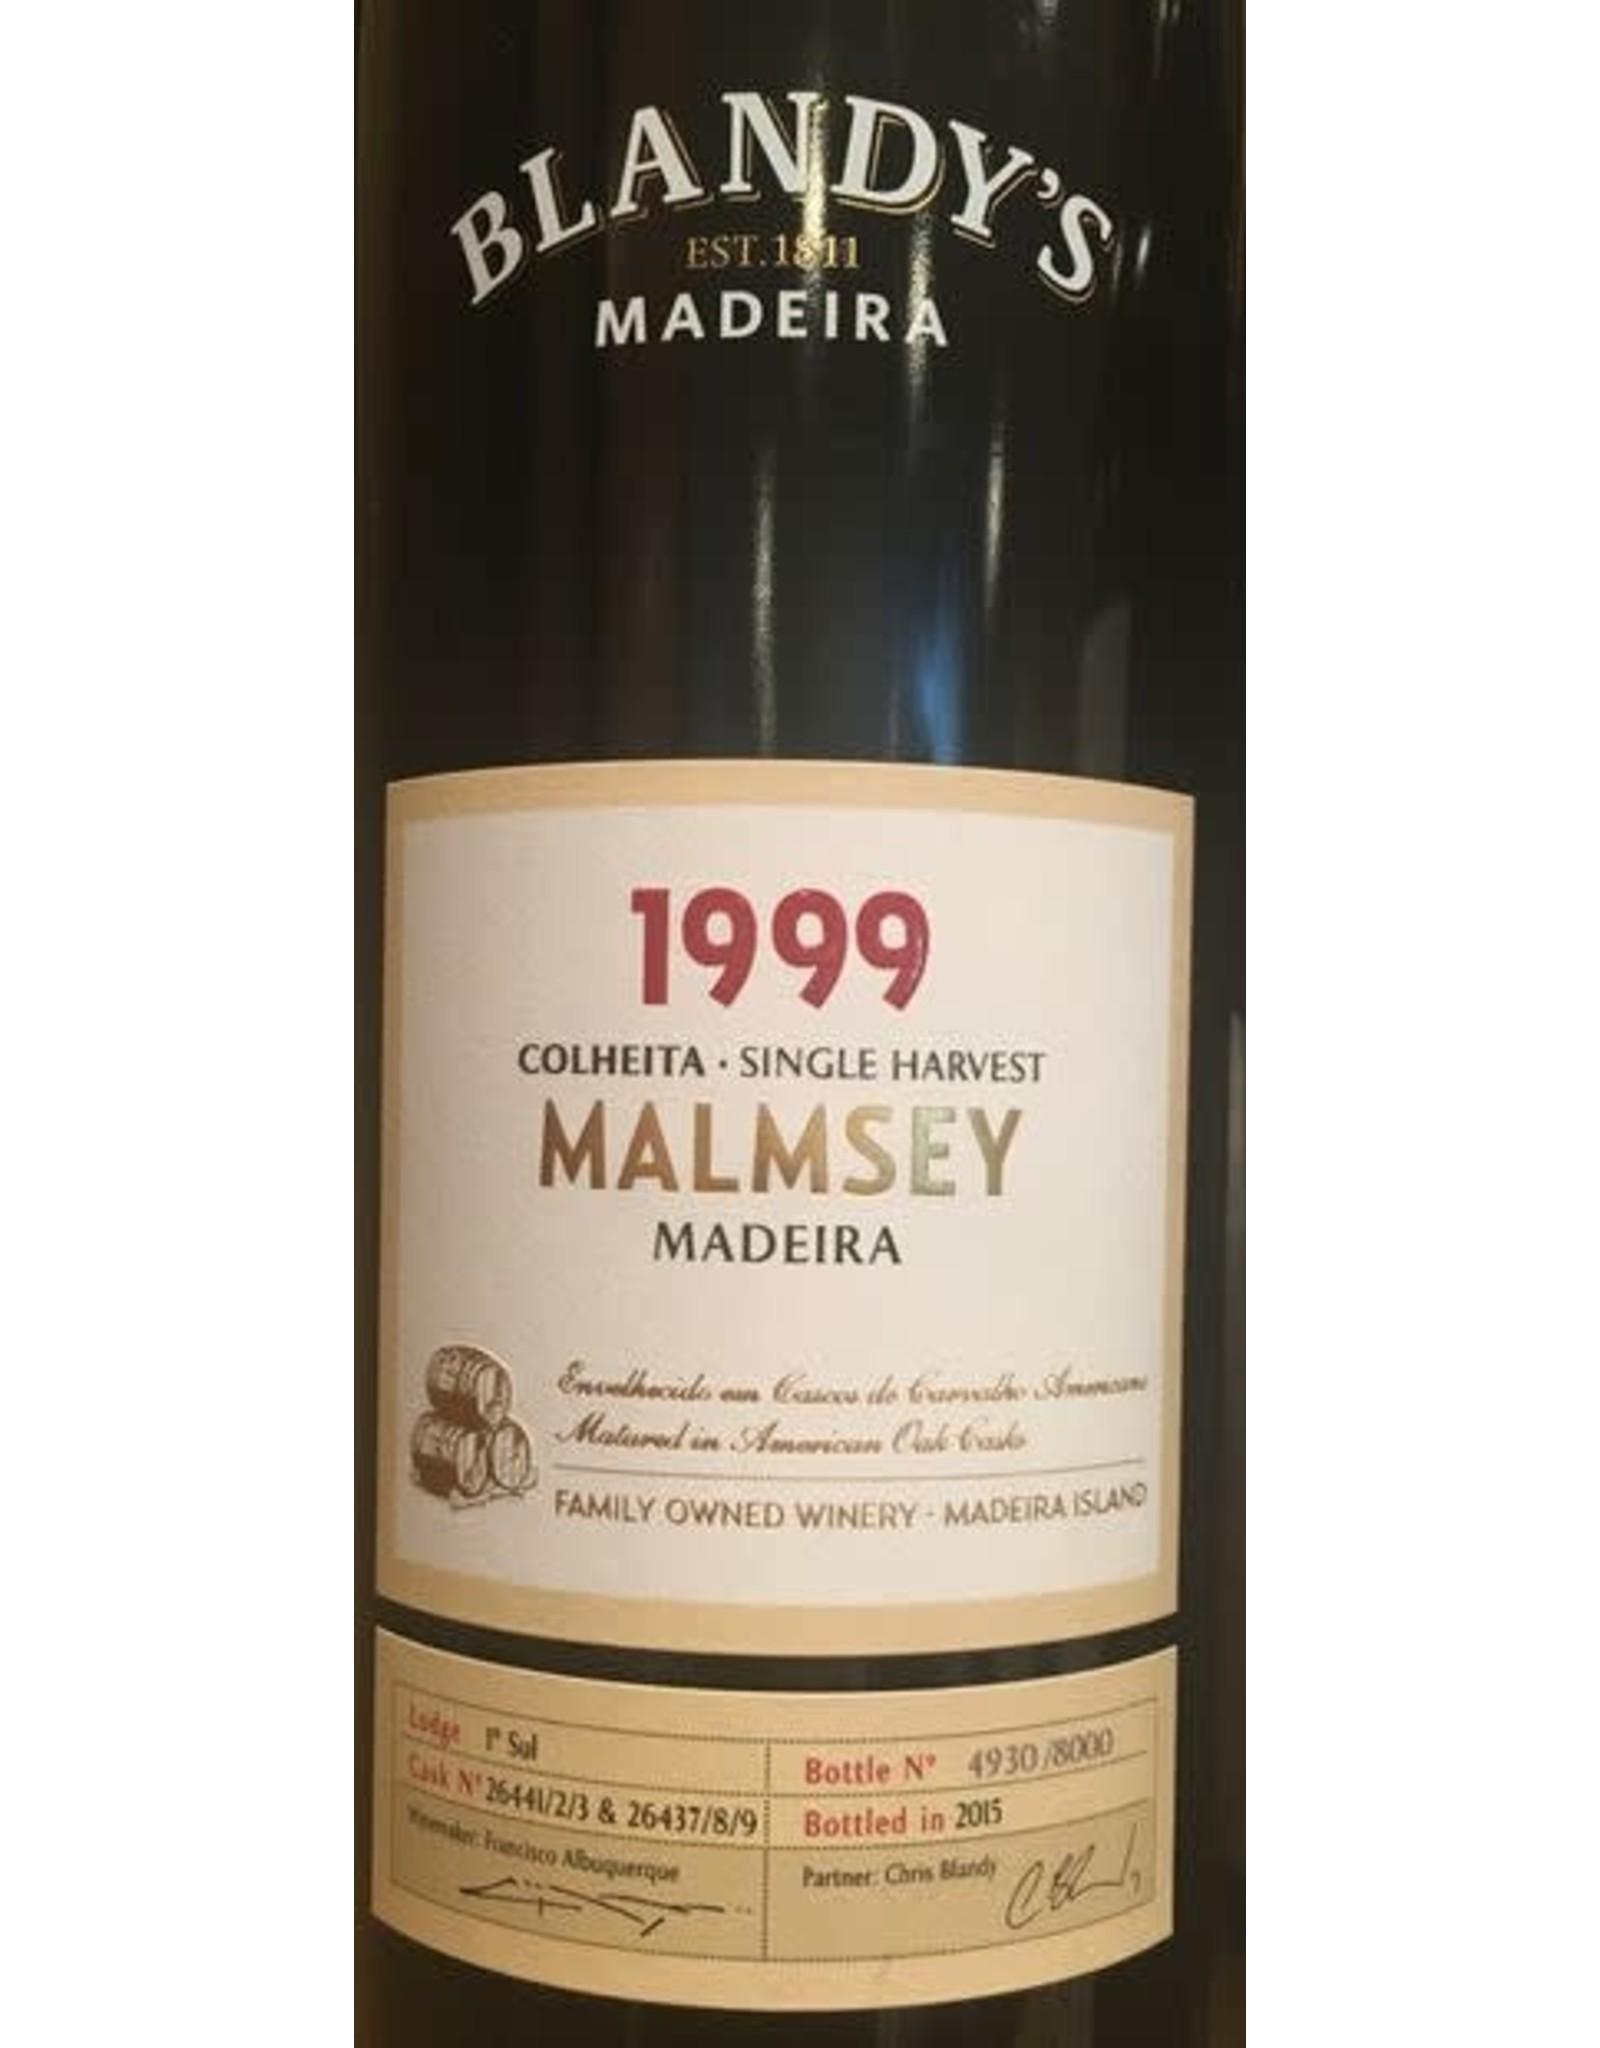 Blandy's Malmsey Madeira 1999